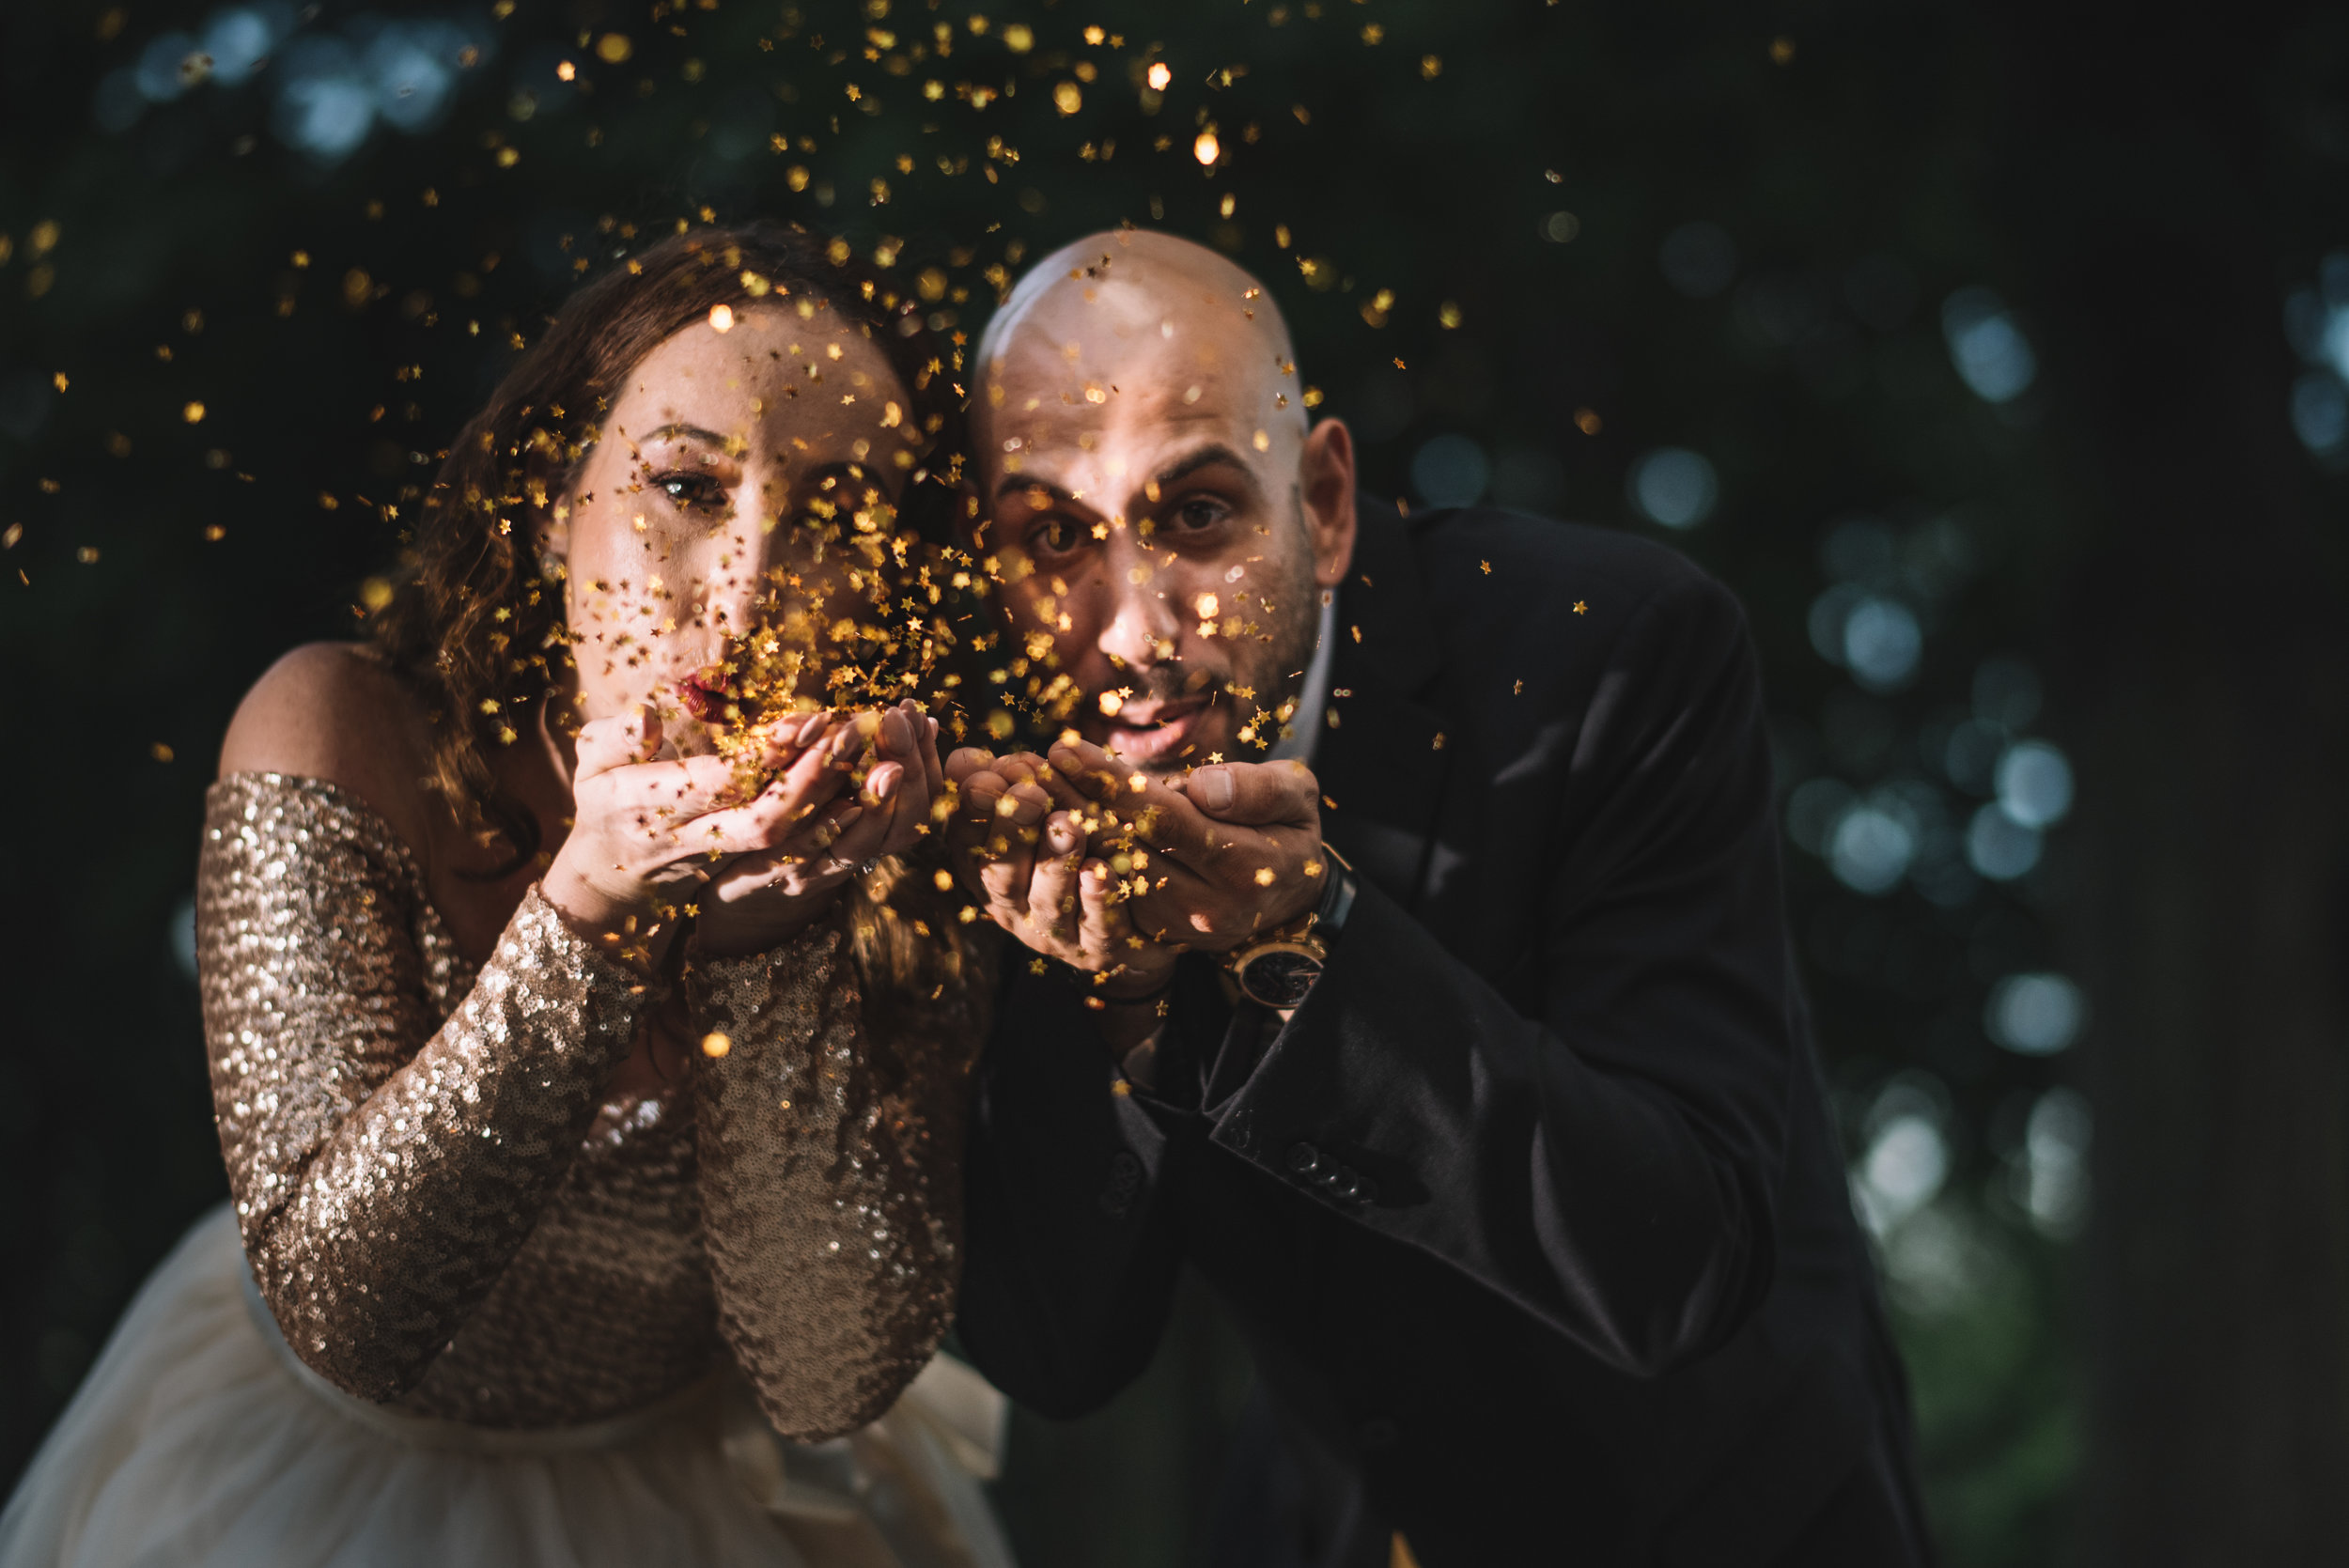 WeddingPhotos | NJPhotographer | Highlights-4-14.jpg